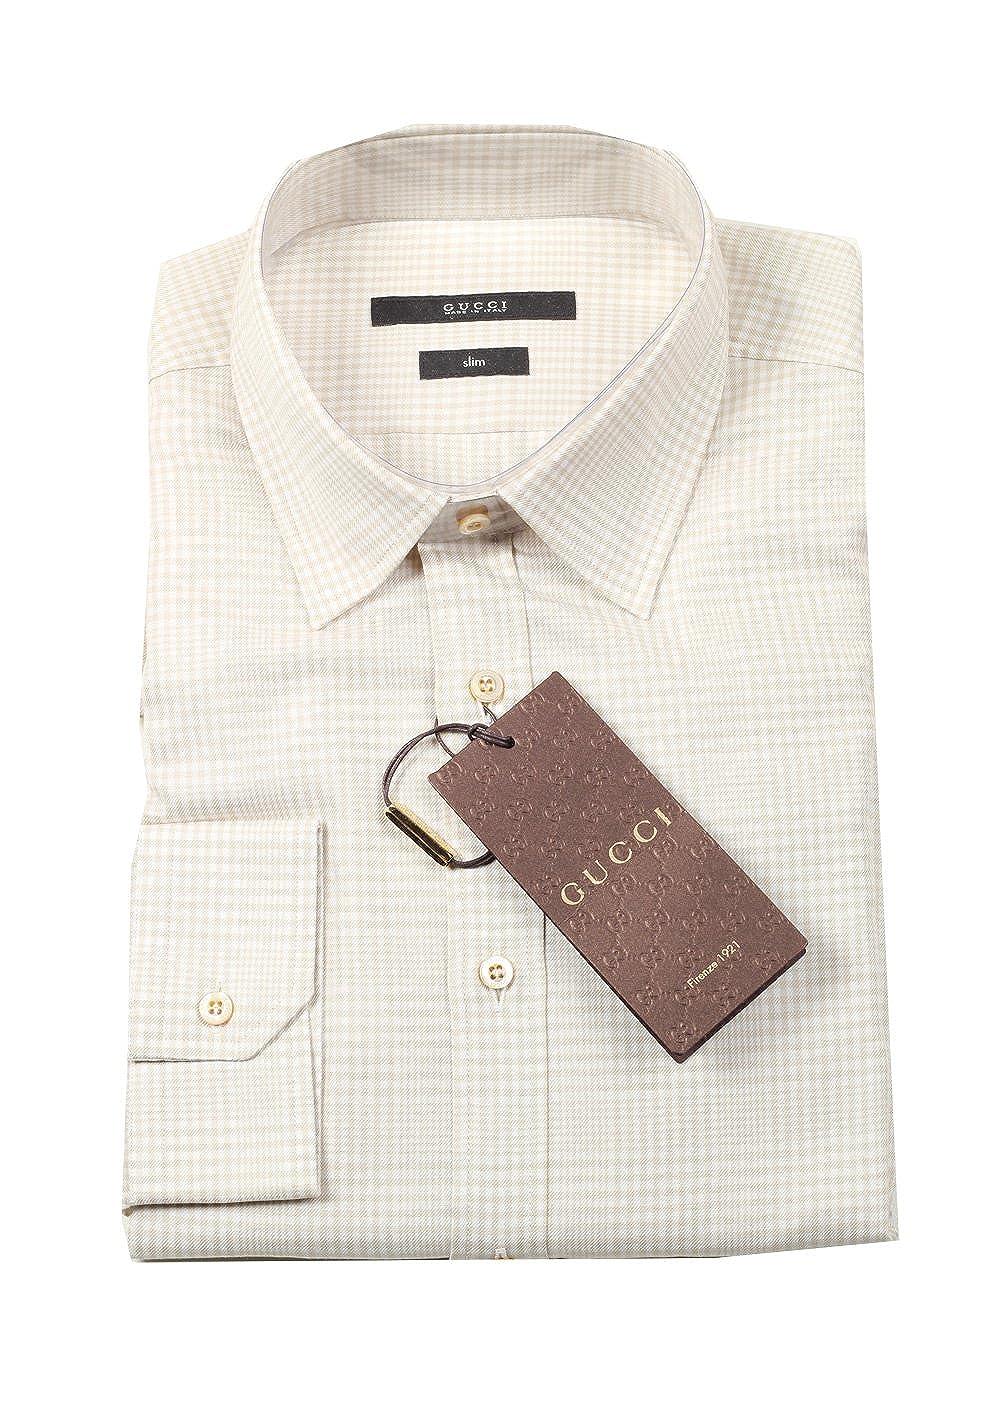 Gucci CL Checked Beige Dress Shirt Size 39/15, 5 U.S.: Amazon.es ...